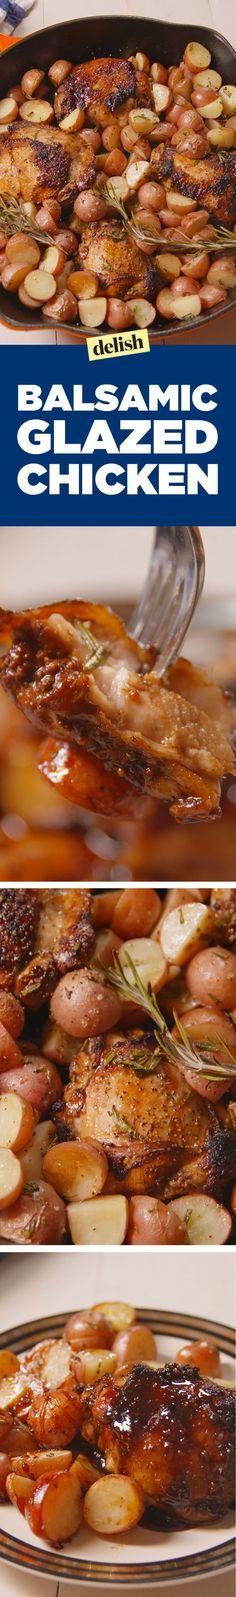 Balsamic Glazed Chicken  - Delish.com